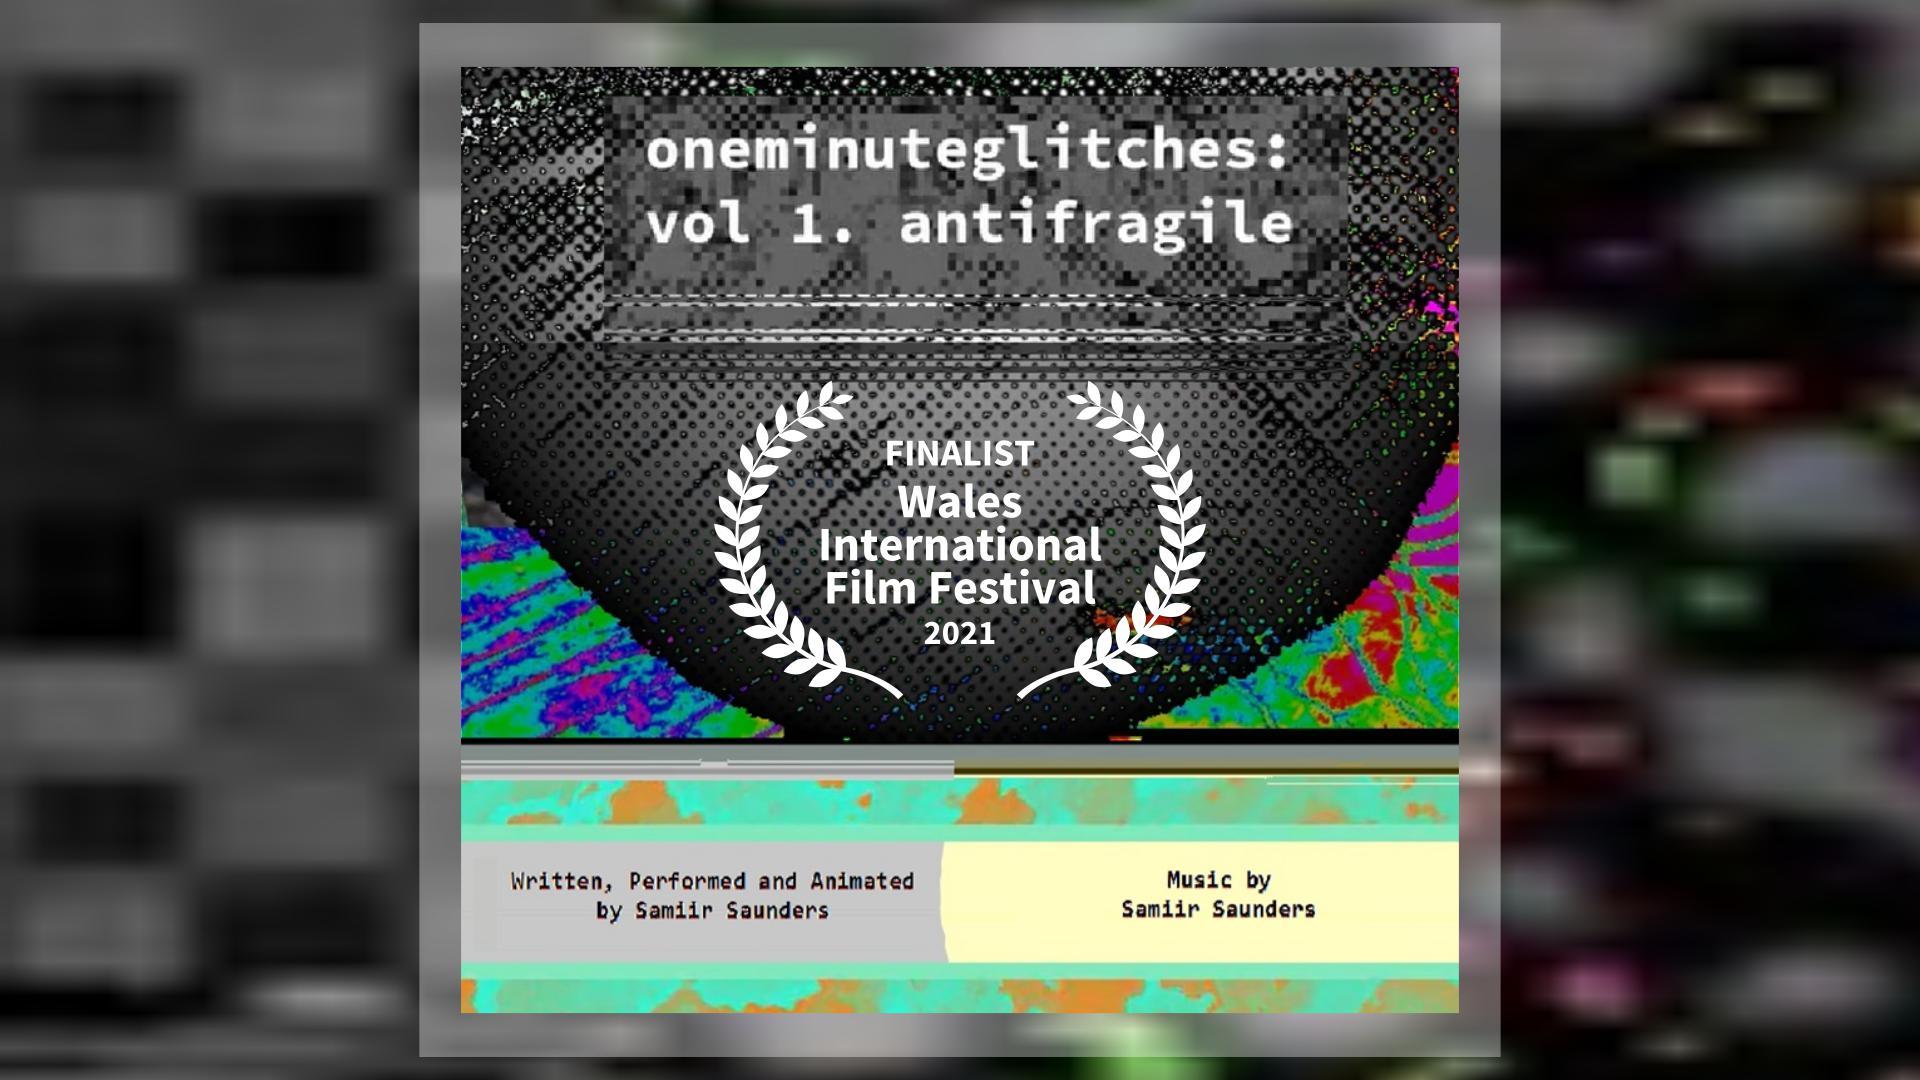 oneminuteglitches: vol 1. antifragile